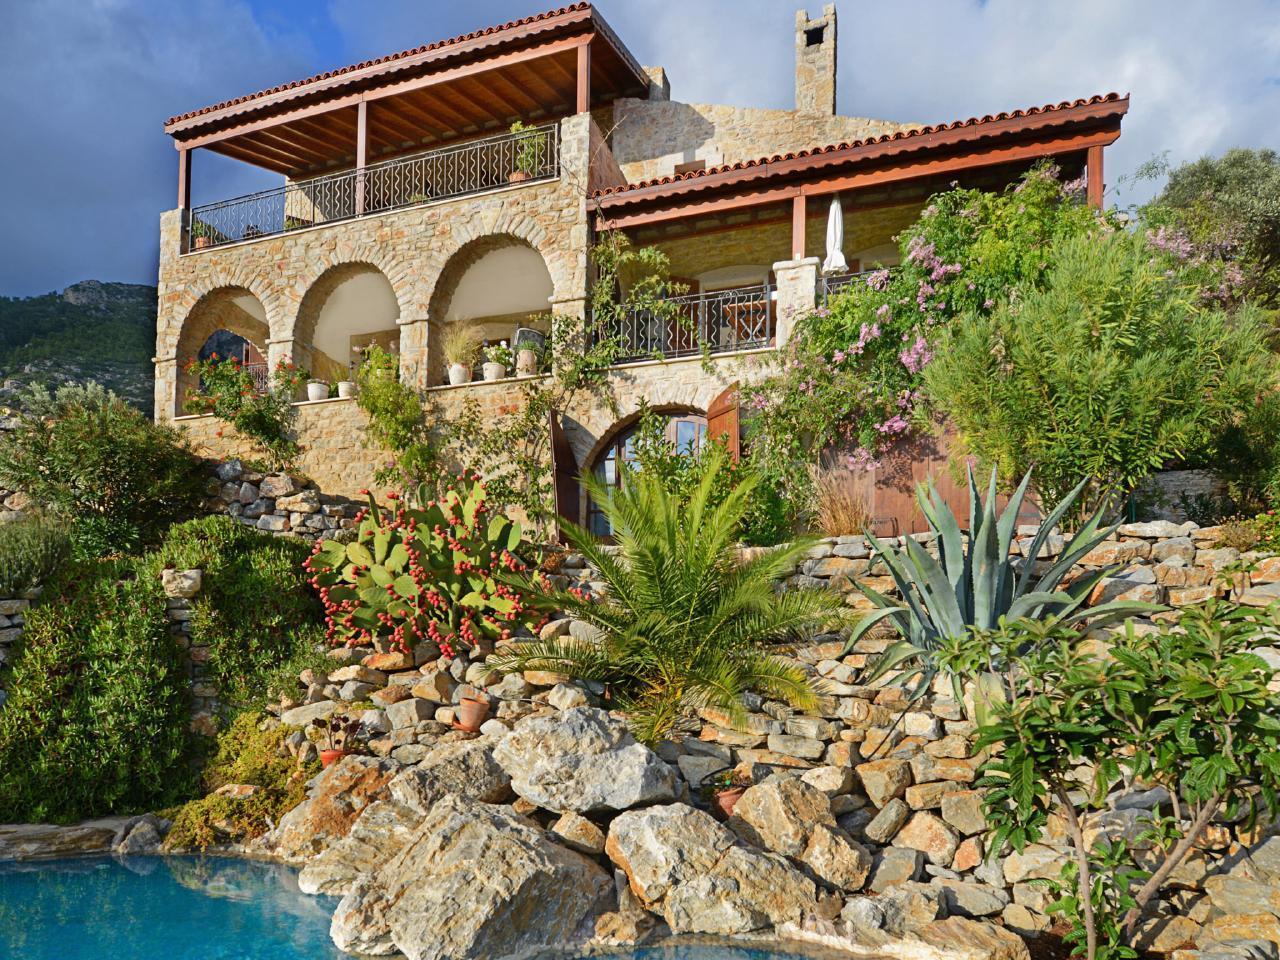 Maison de vacances Exklusives Chalet, romantisch am Berghang und Meer gelegen (2506674), Mesudiye, , Région Egéenne, Turquie, image 17